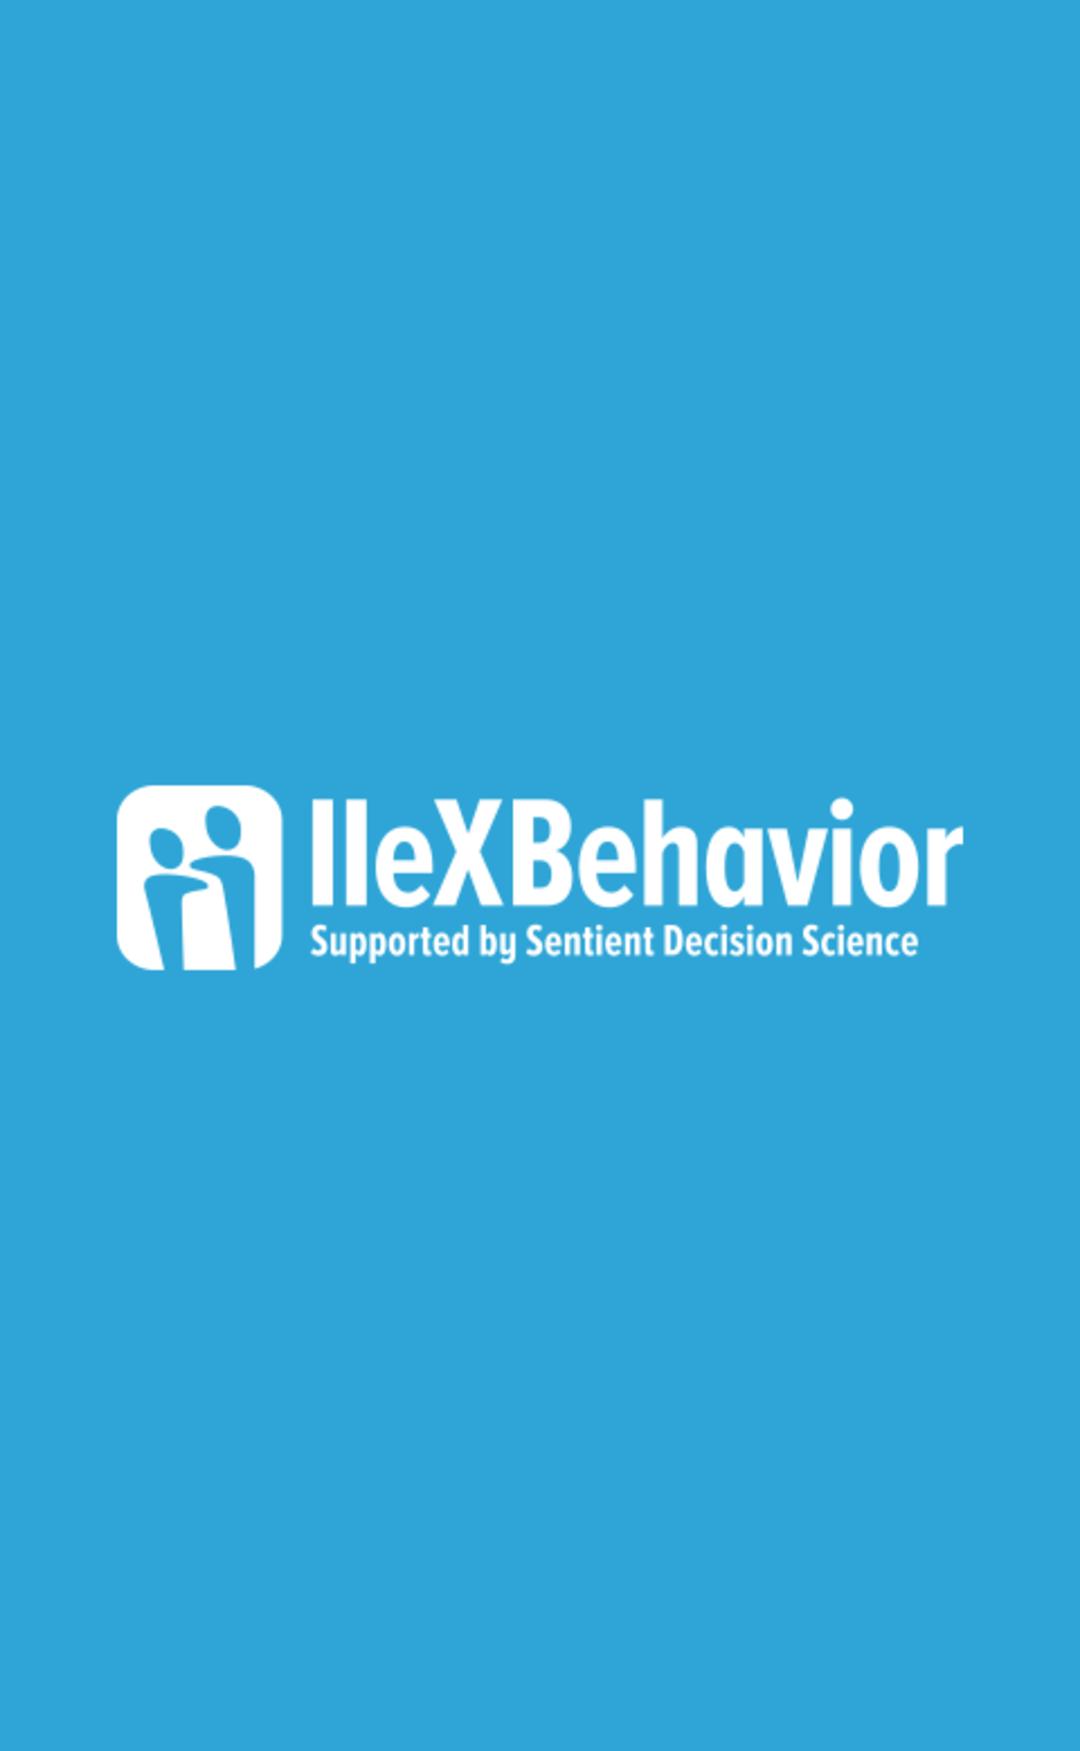 Agenda | IIeX Behavior 2018